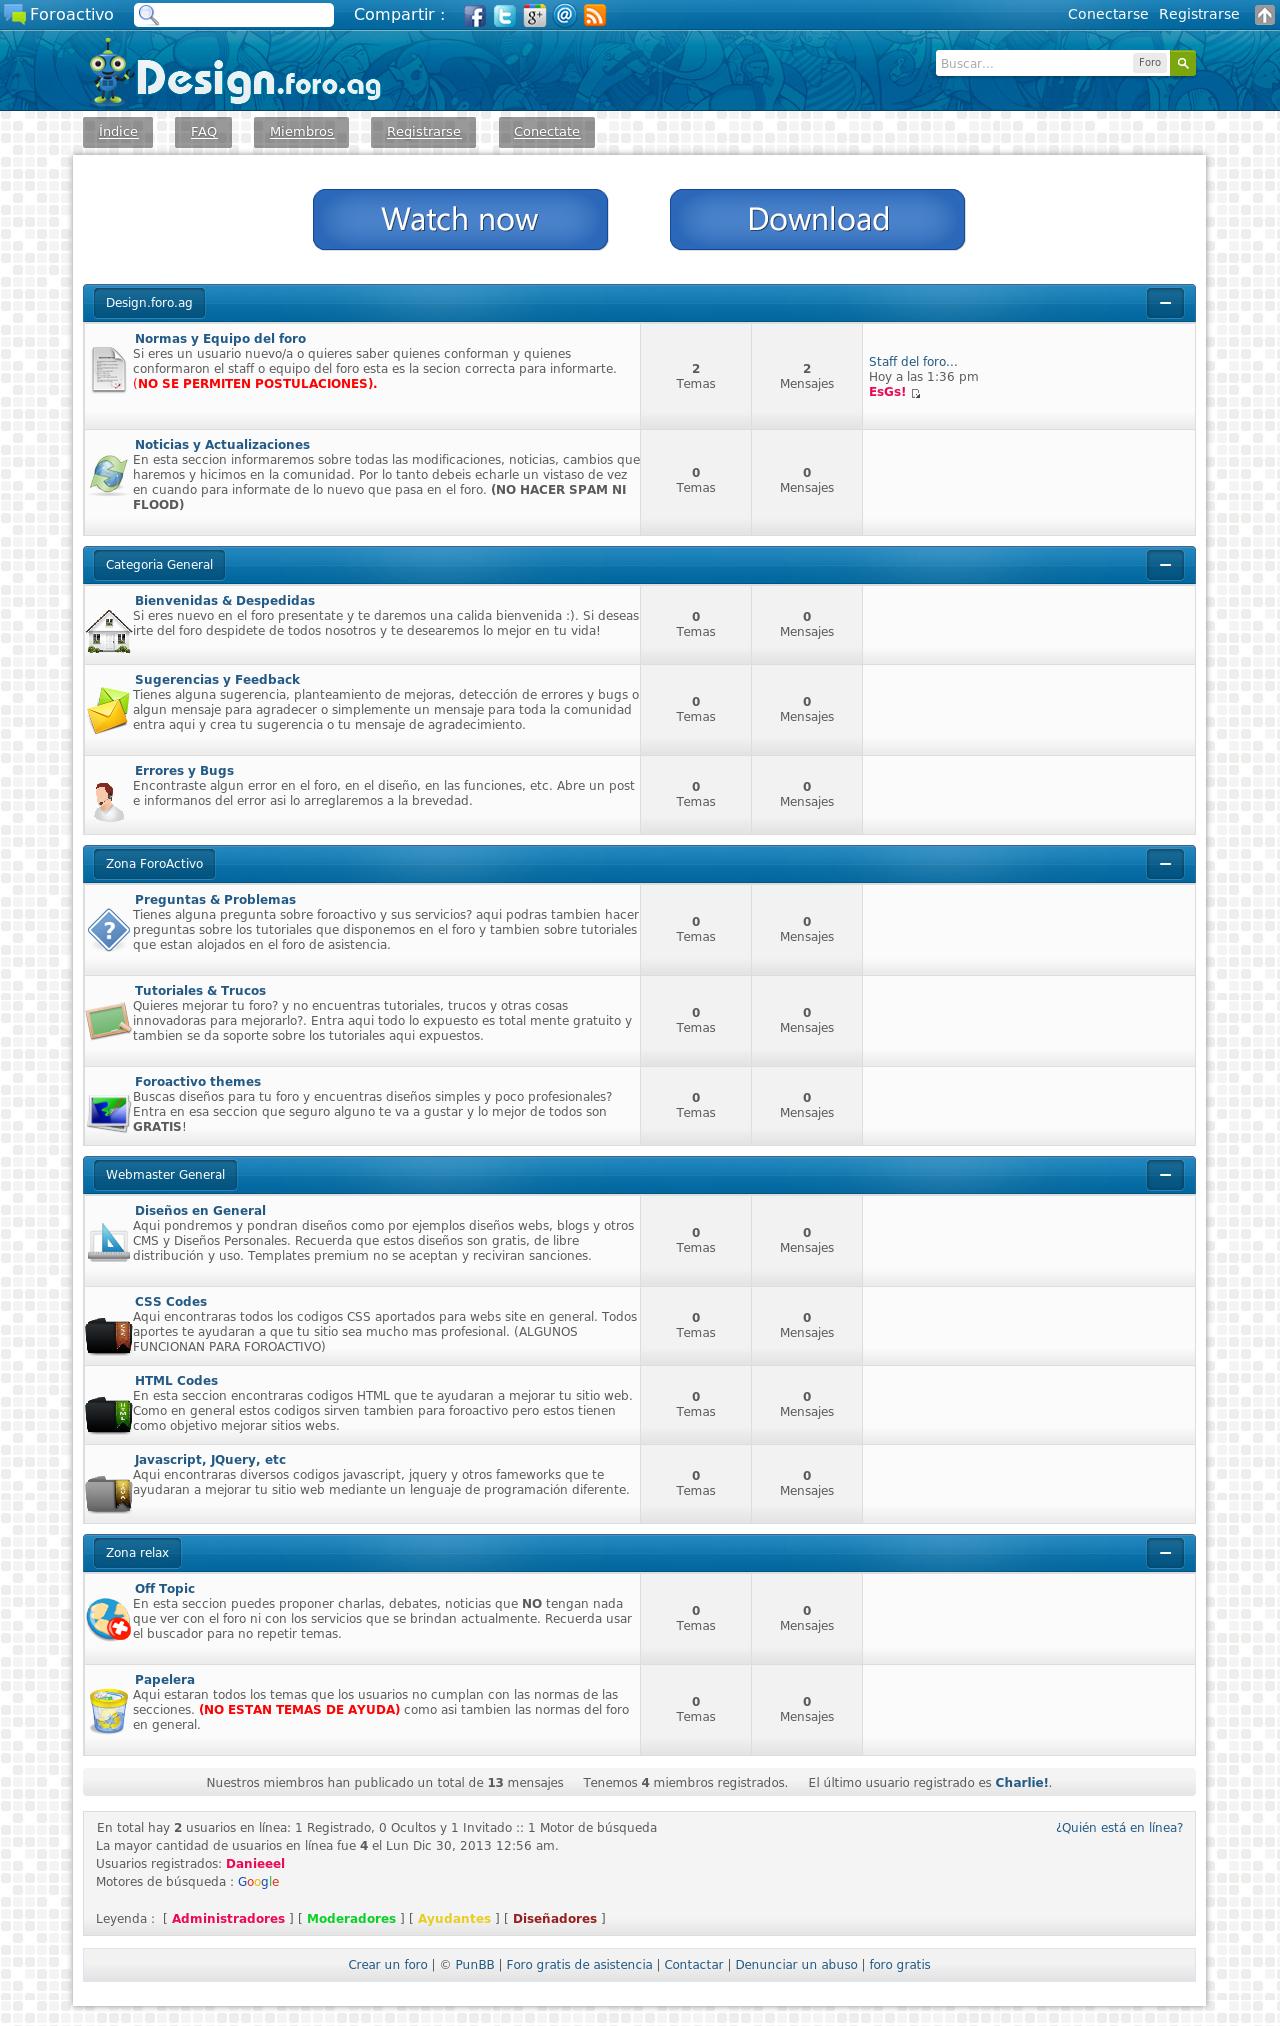 Design.foro.ag - Comunidad de Ayuda Foro-4356b52